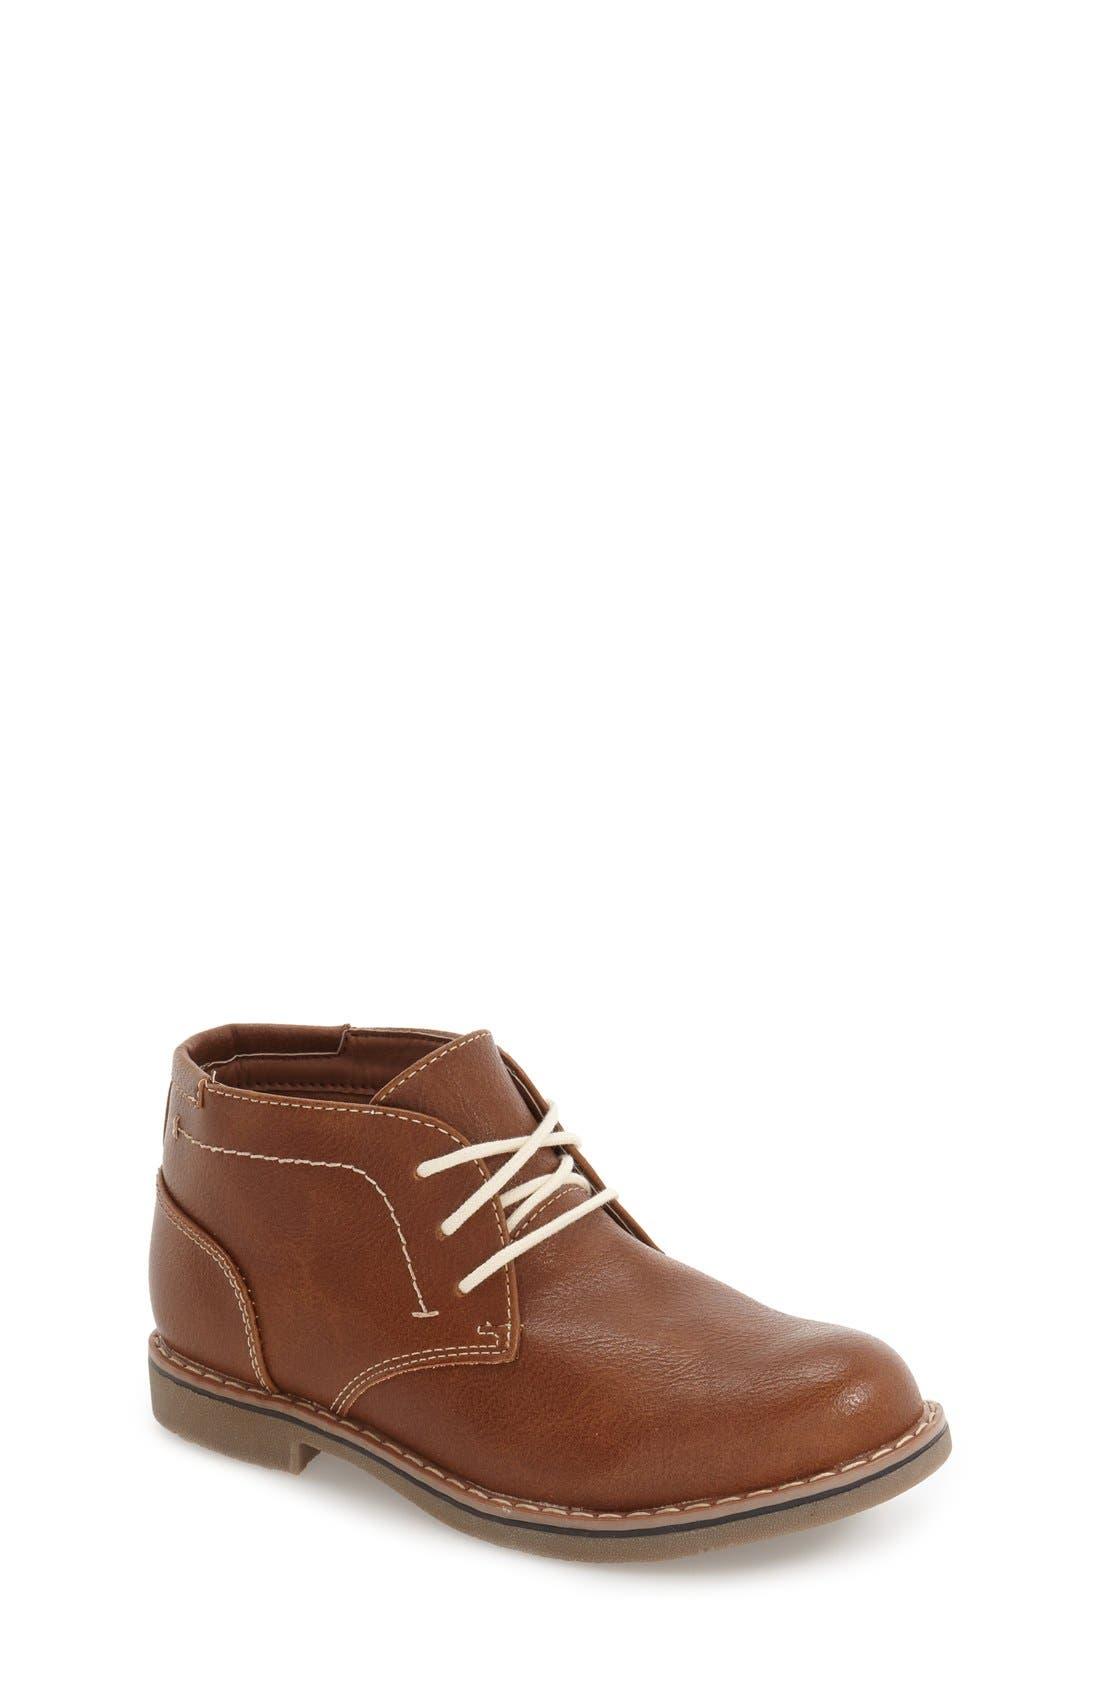 Classic Chukka Boot,                             Main thumbnail 1, color,                             Cognac Faux Leather